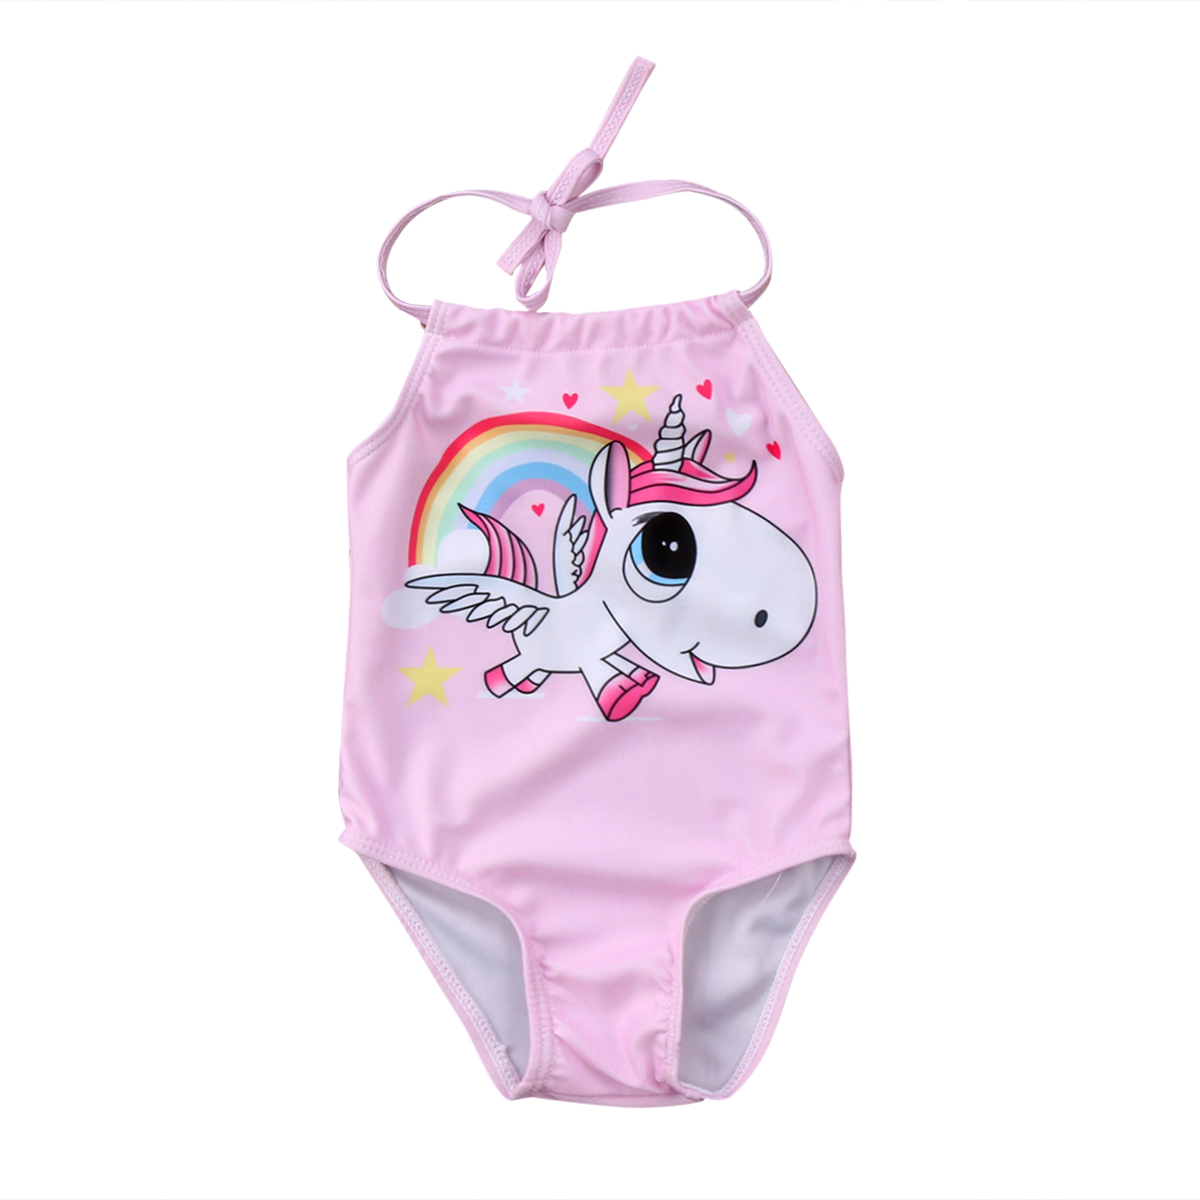 Fashion Newborn Baby Girls Cute Bikini Swimwear Swimsuit Bathing Suit Beachwear